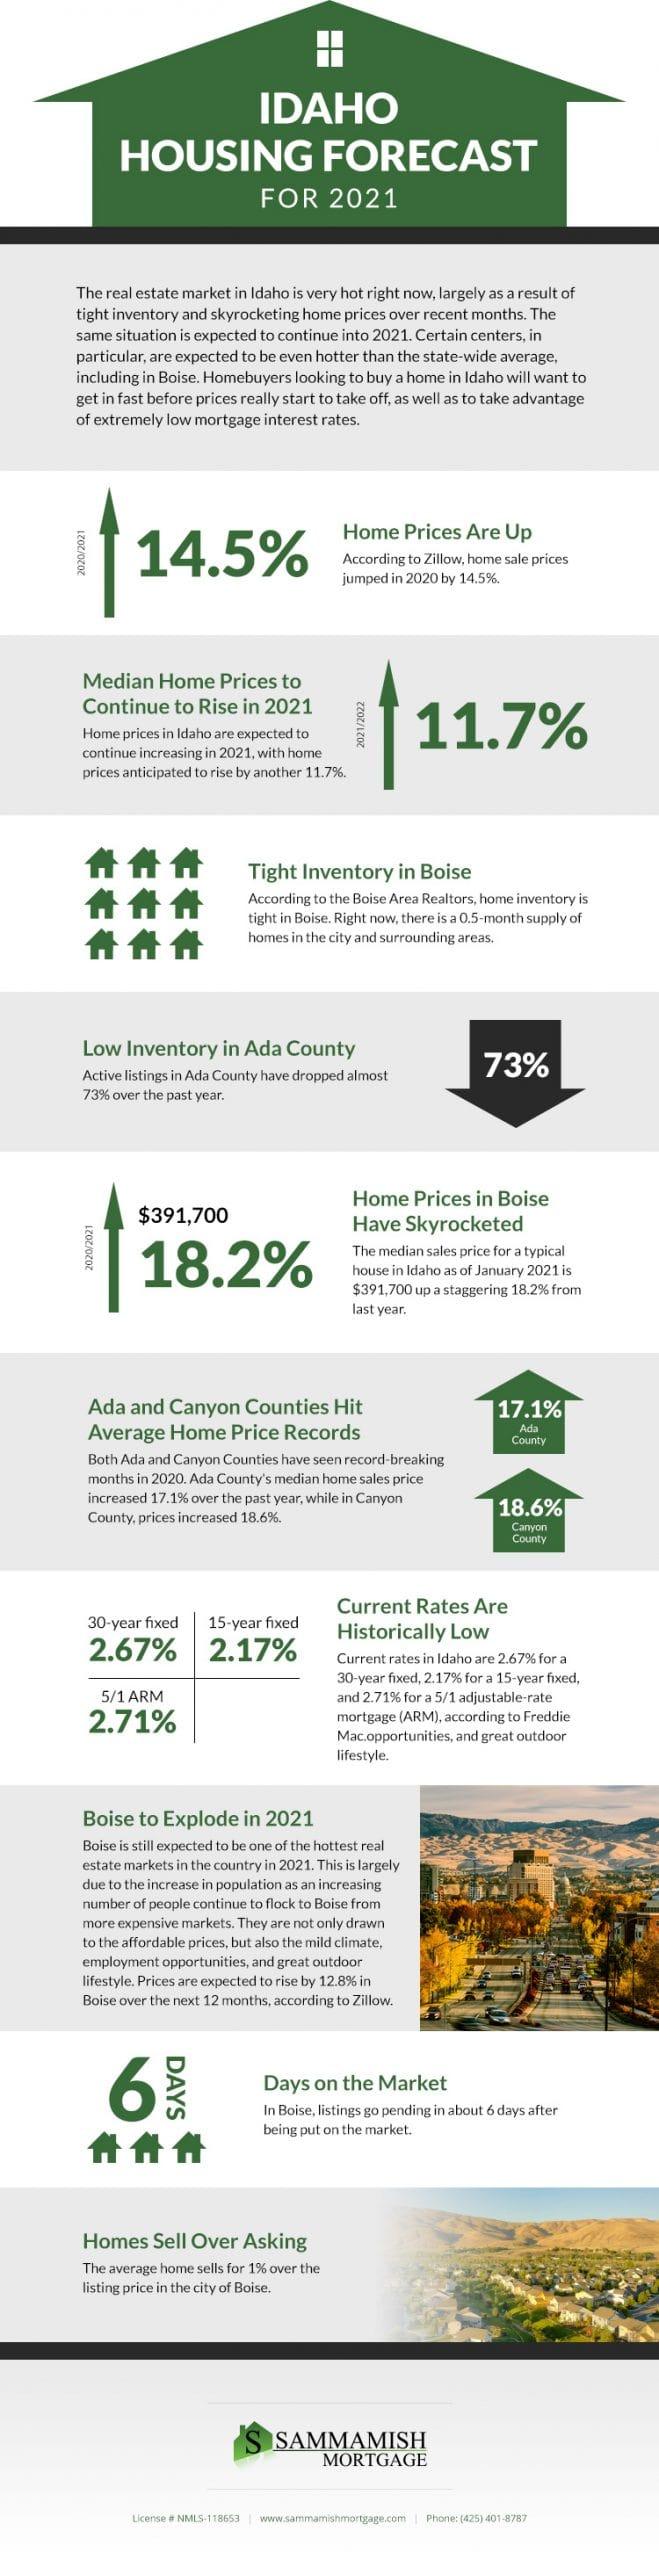 Idaho Housing Forecast for 2021